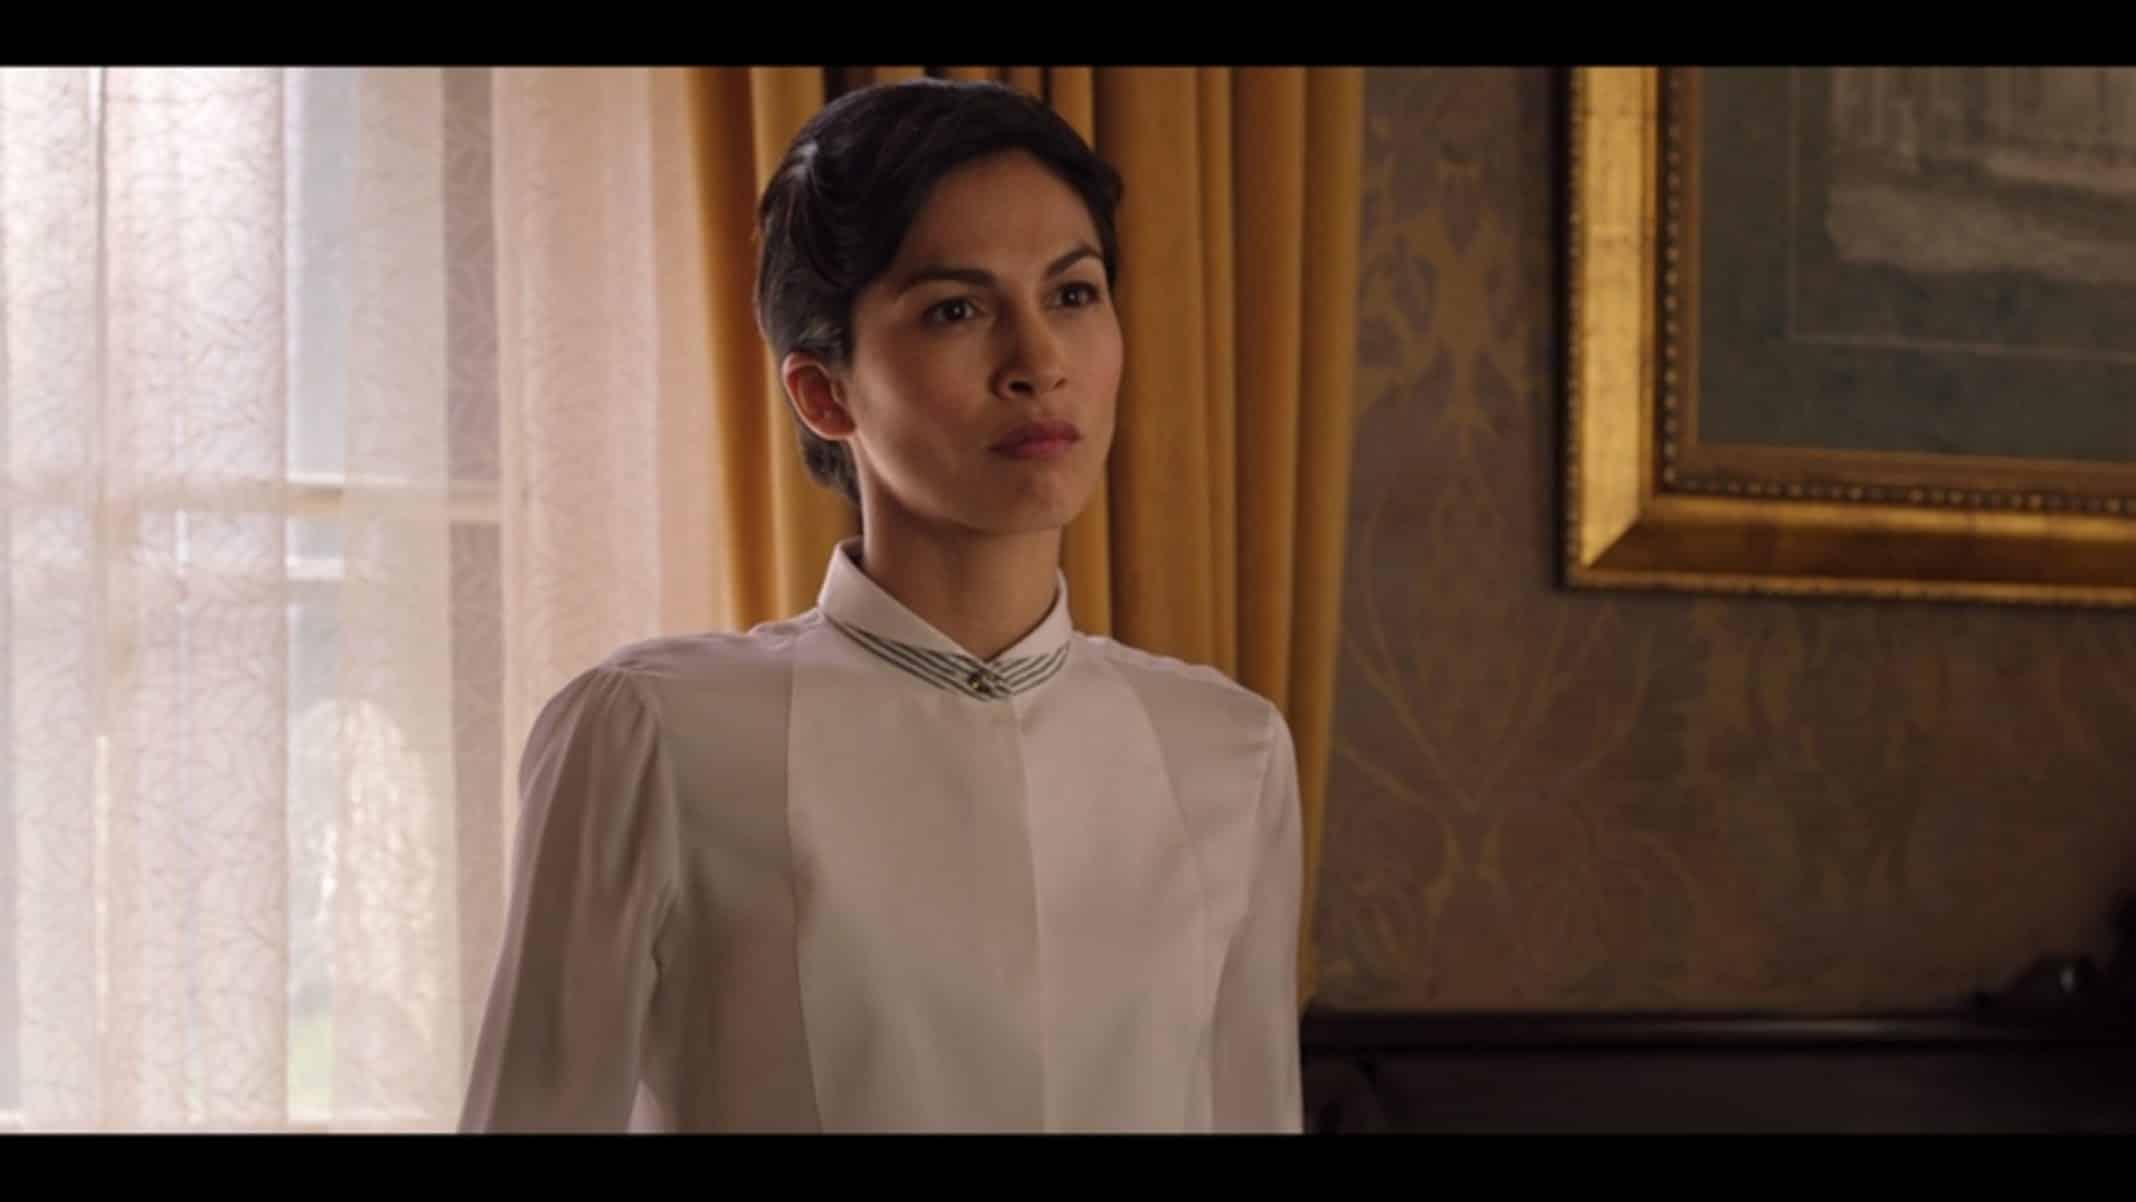 Catherine (Elodie Yung) chastising Sam.